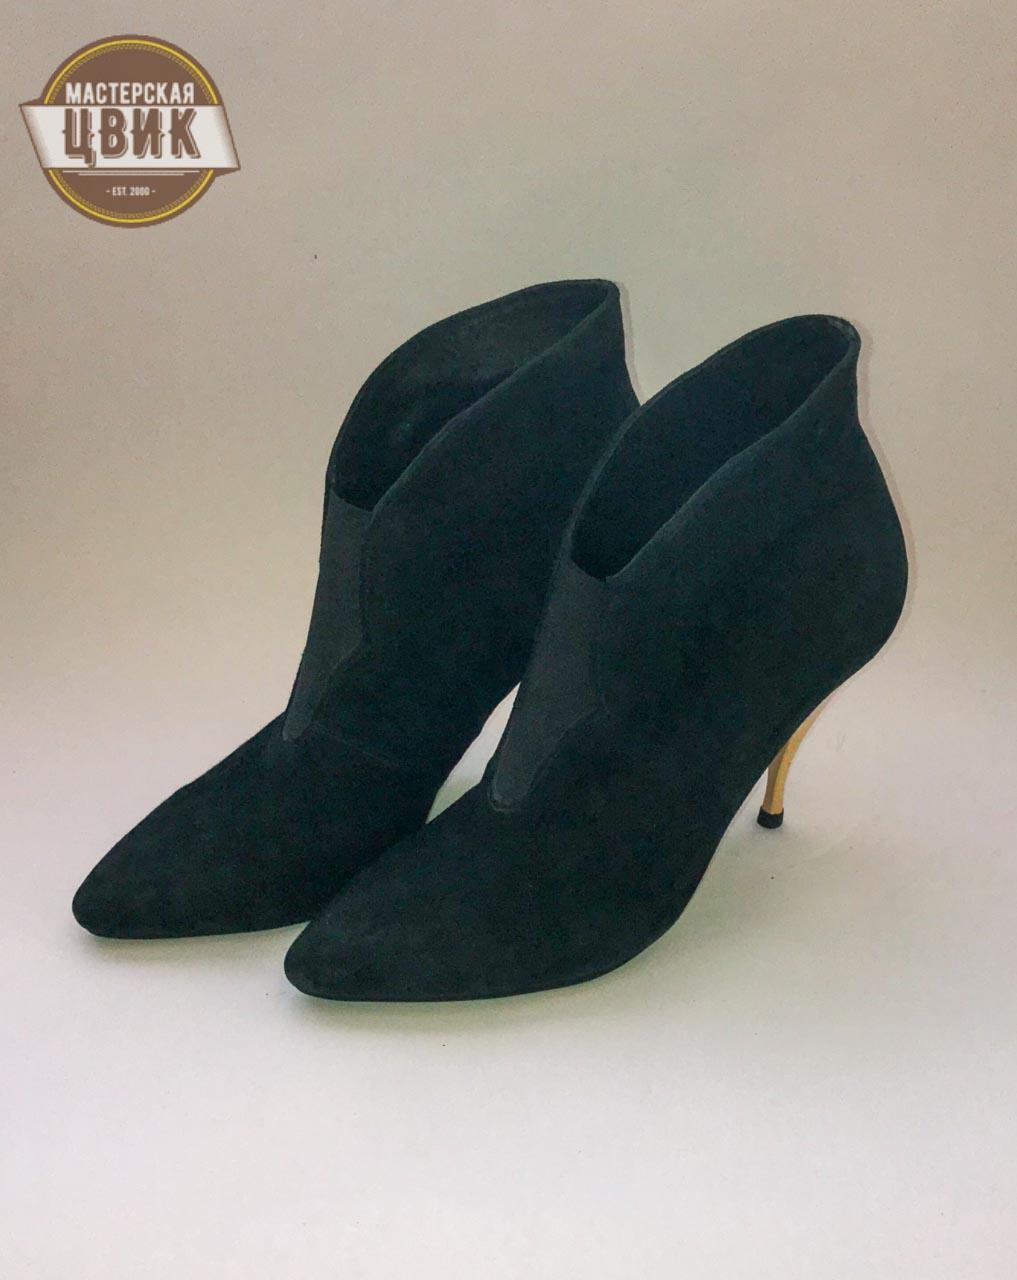 individualnyj-poshiv-obuvi-minsk-45 Индивидуальный пошив обуви